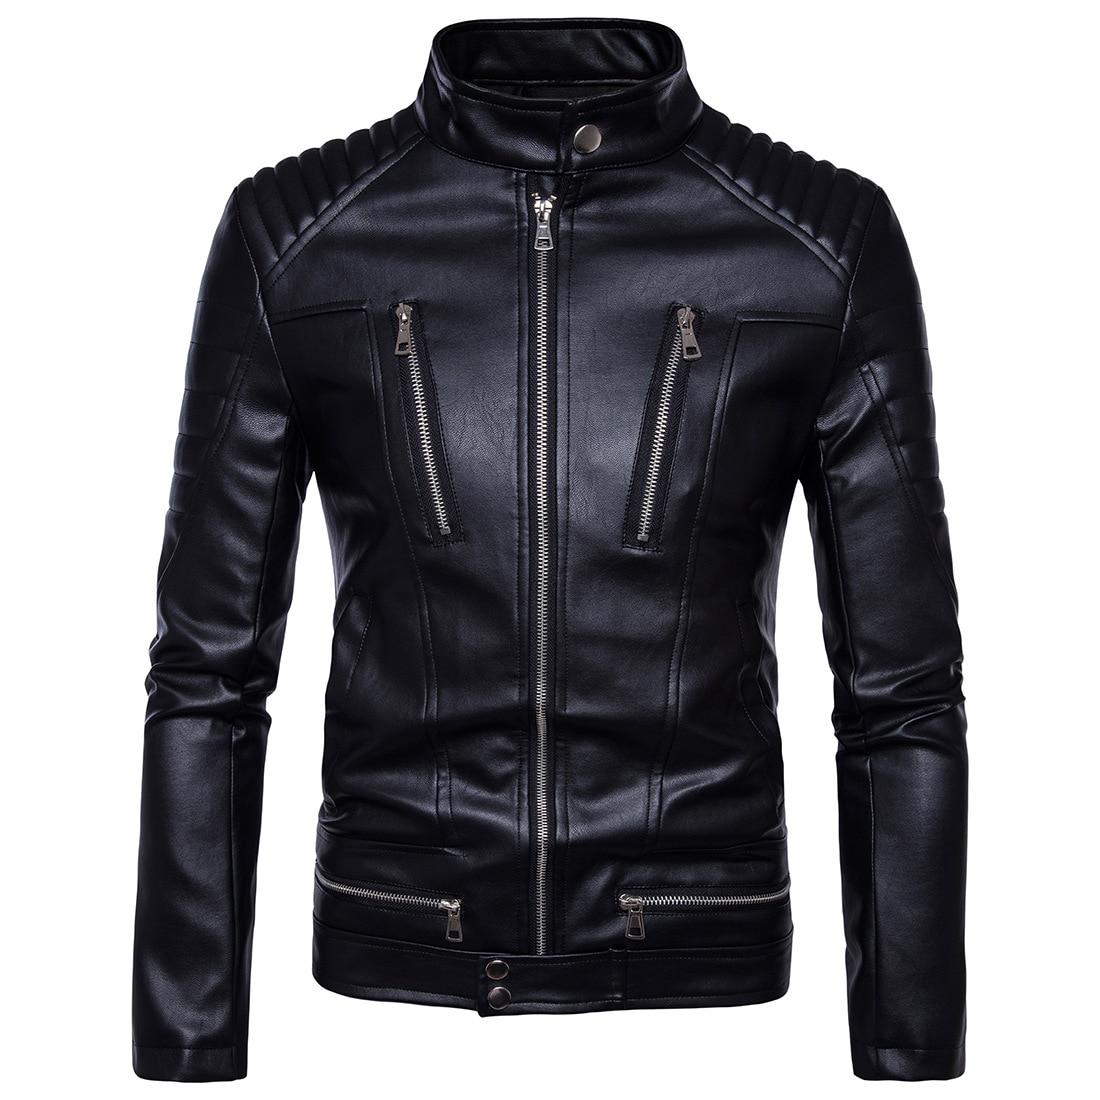 [Code] European  Boutique Punk Men'S Wear Locomotive Multi-Zipper Leather Coat Motorcycle Leather Coat Jacket B013